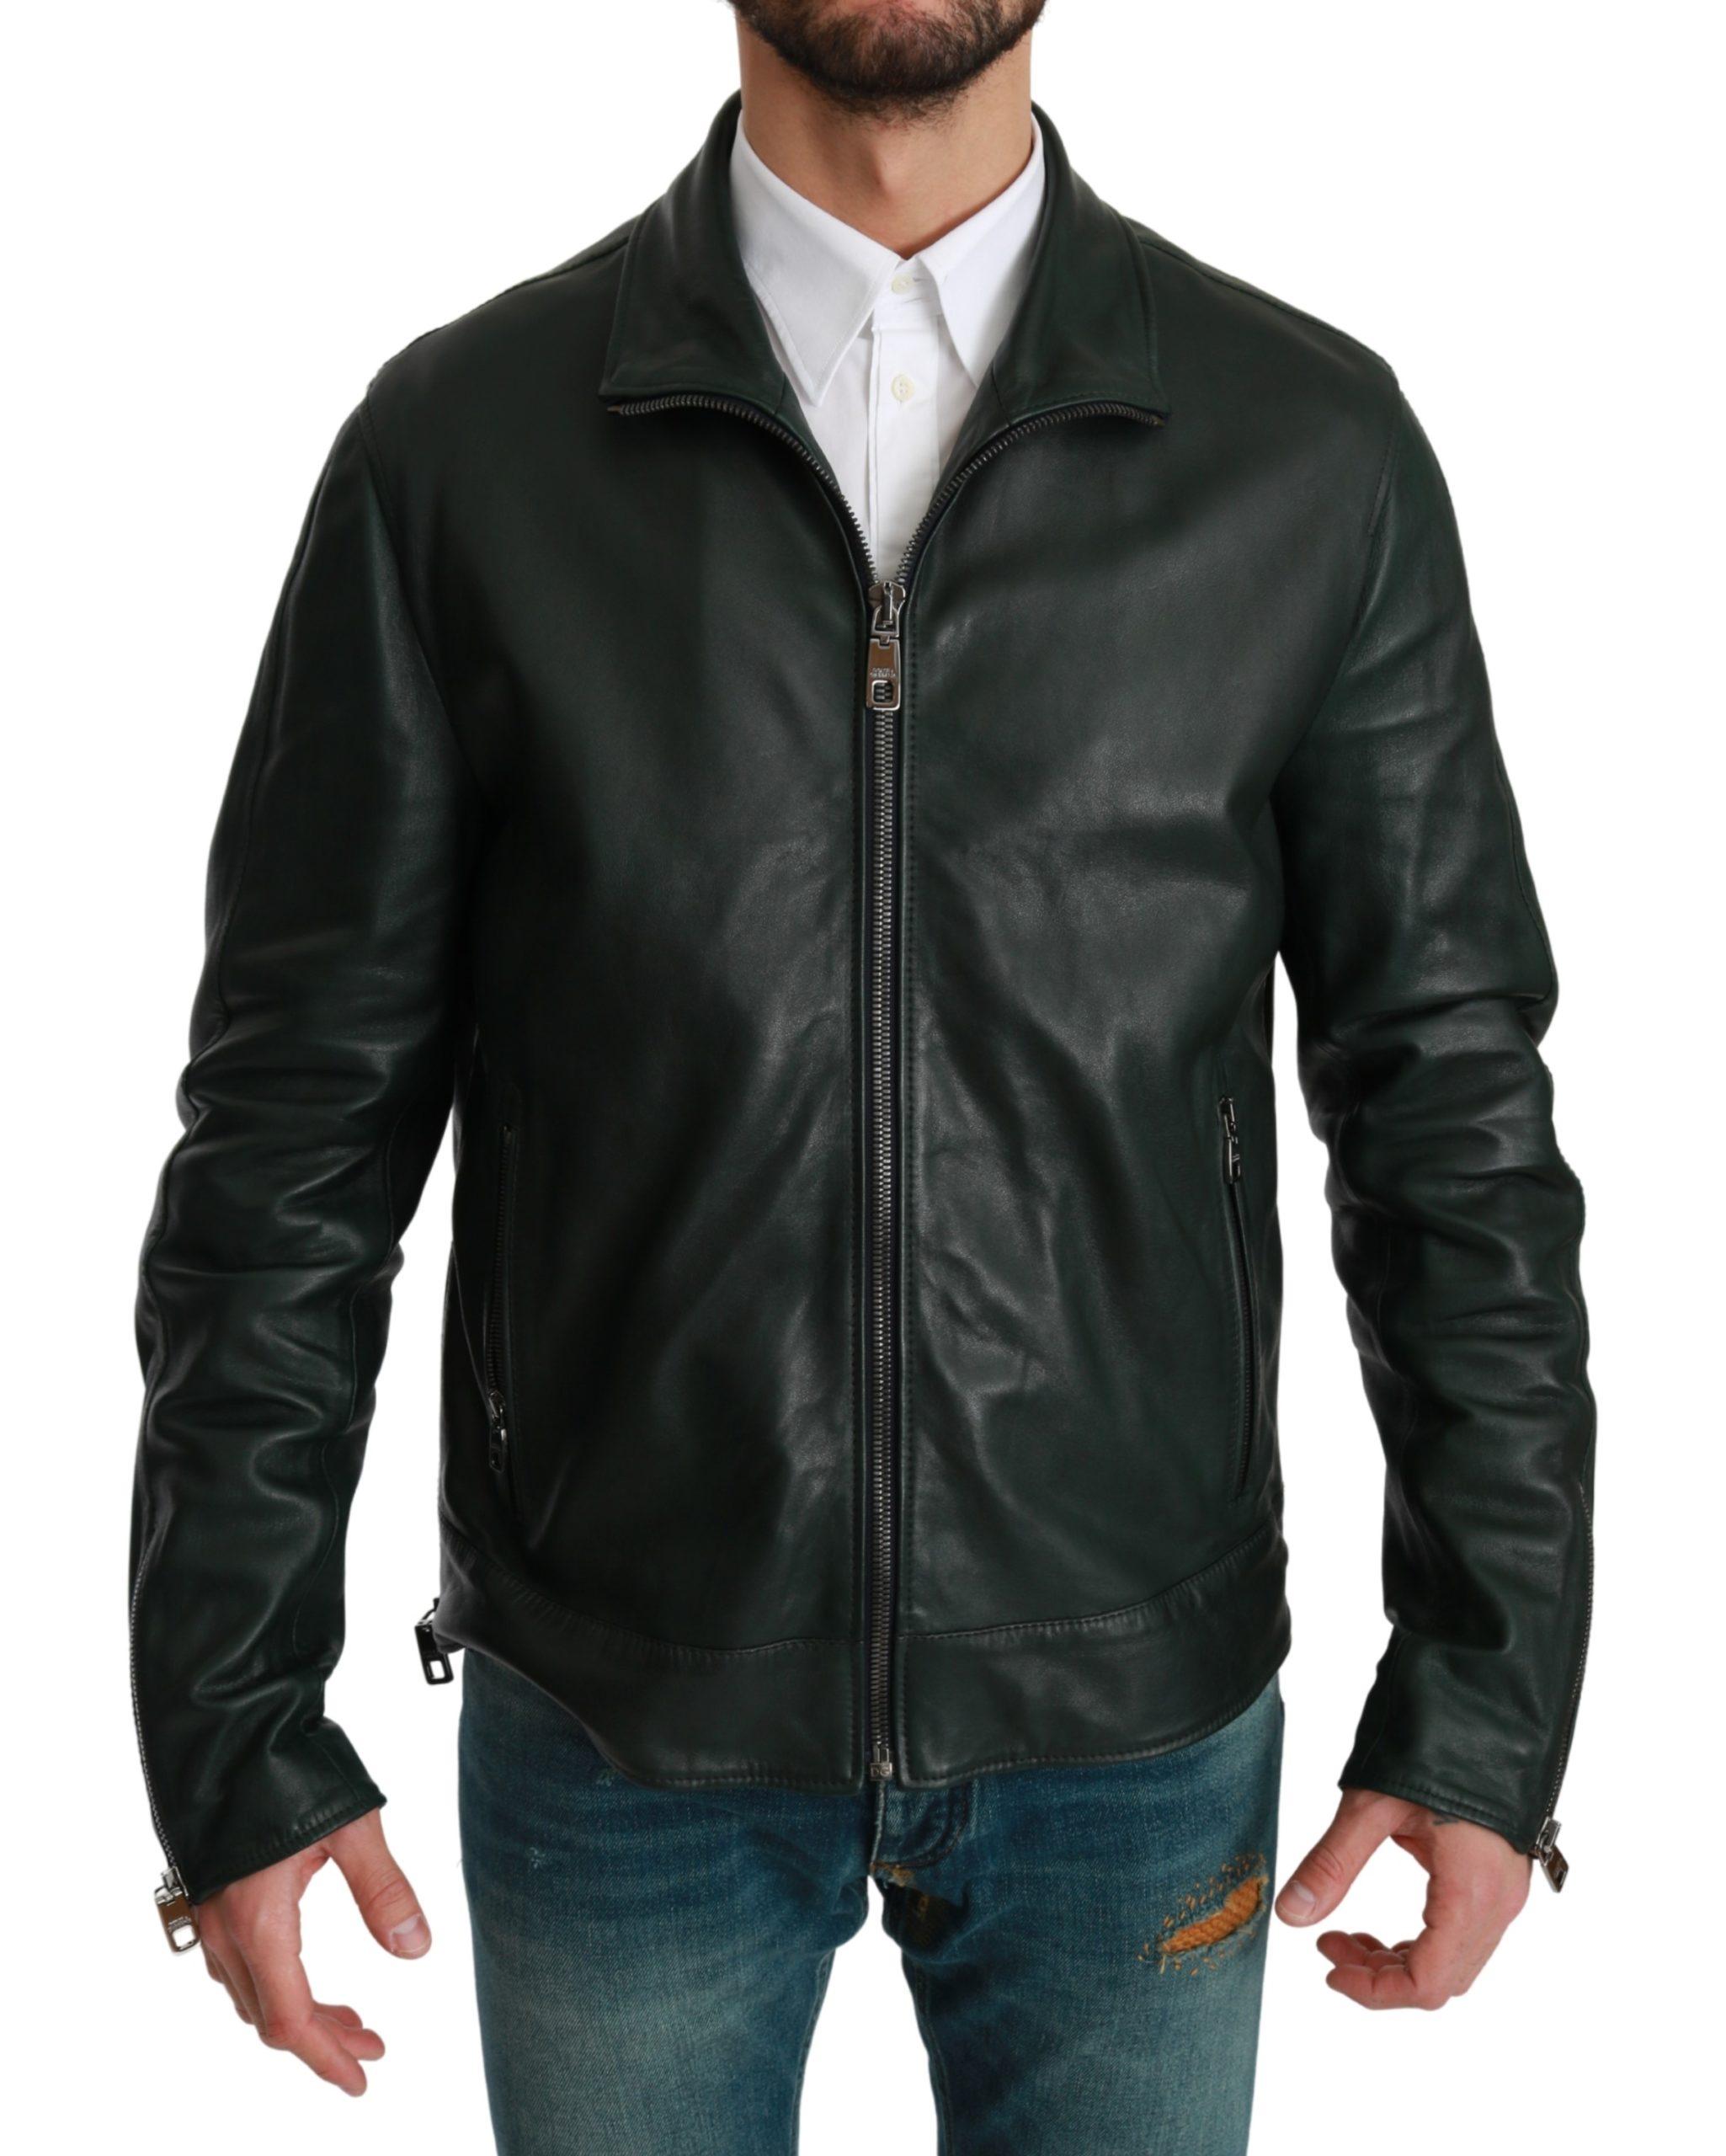 Dolce & Gabbana Men's Full Zip Biker Leather Coat Green JKT2614 - IT52   XL